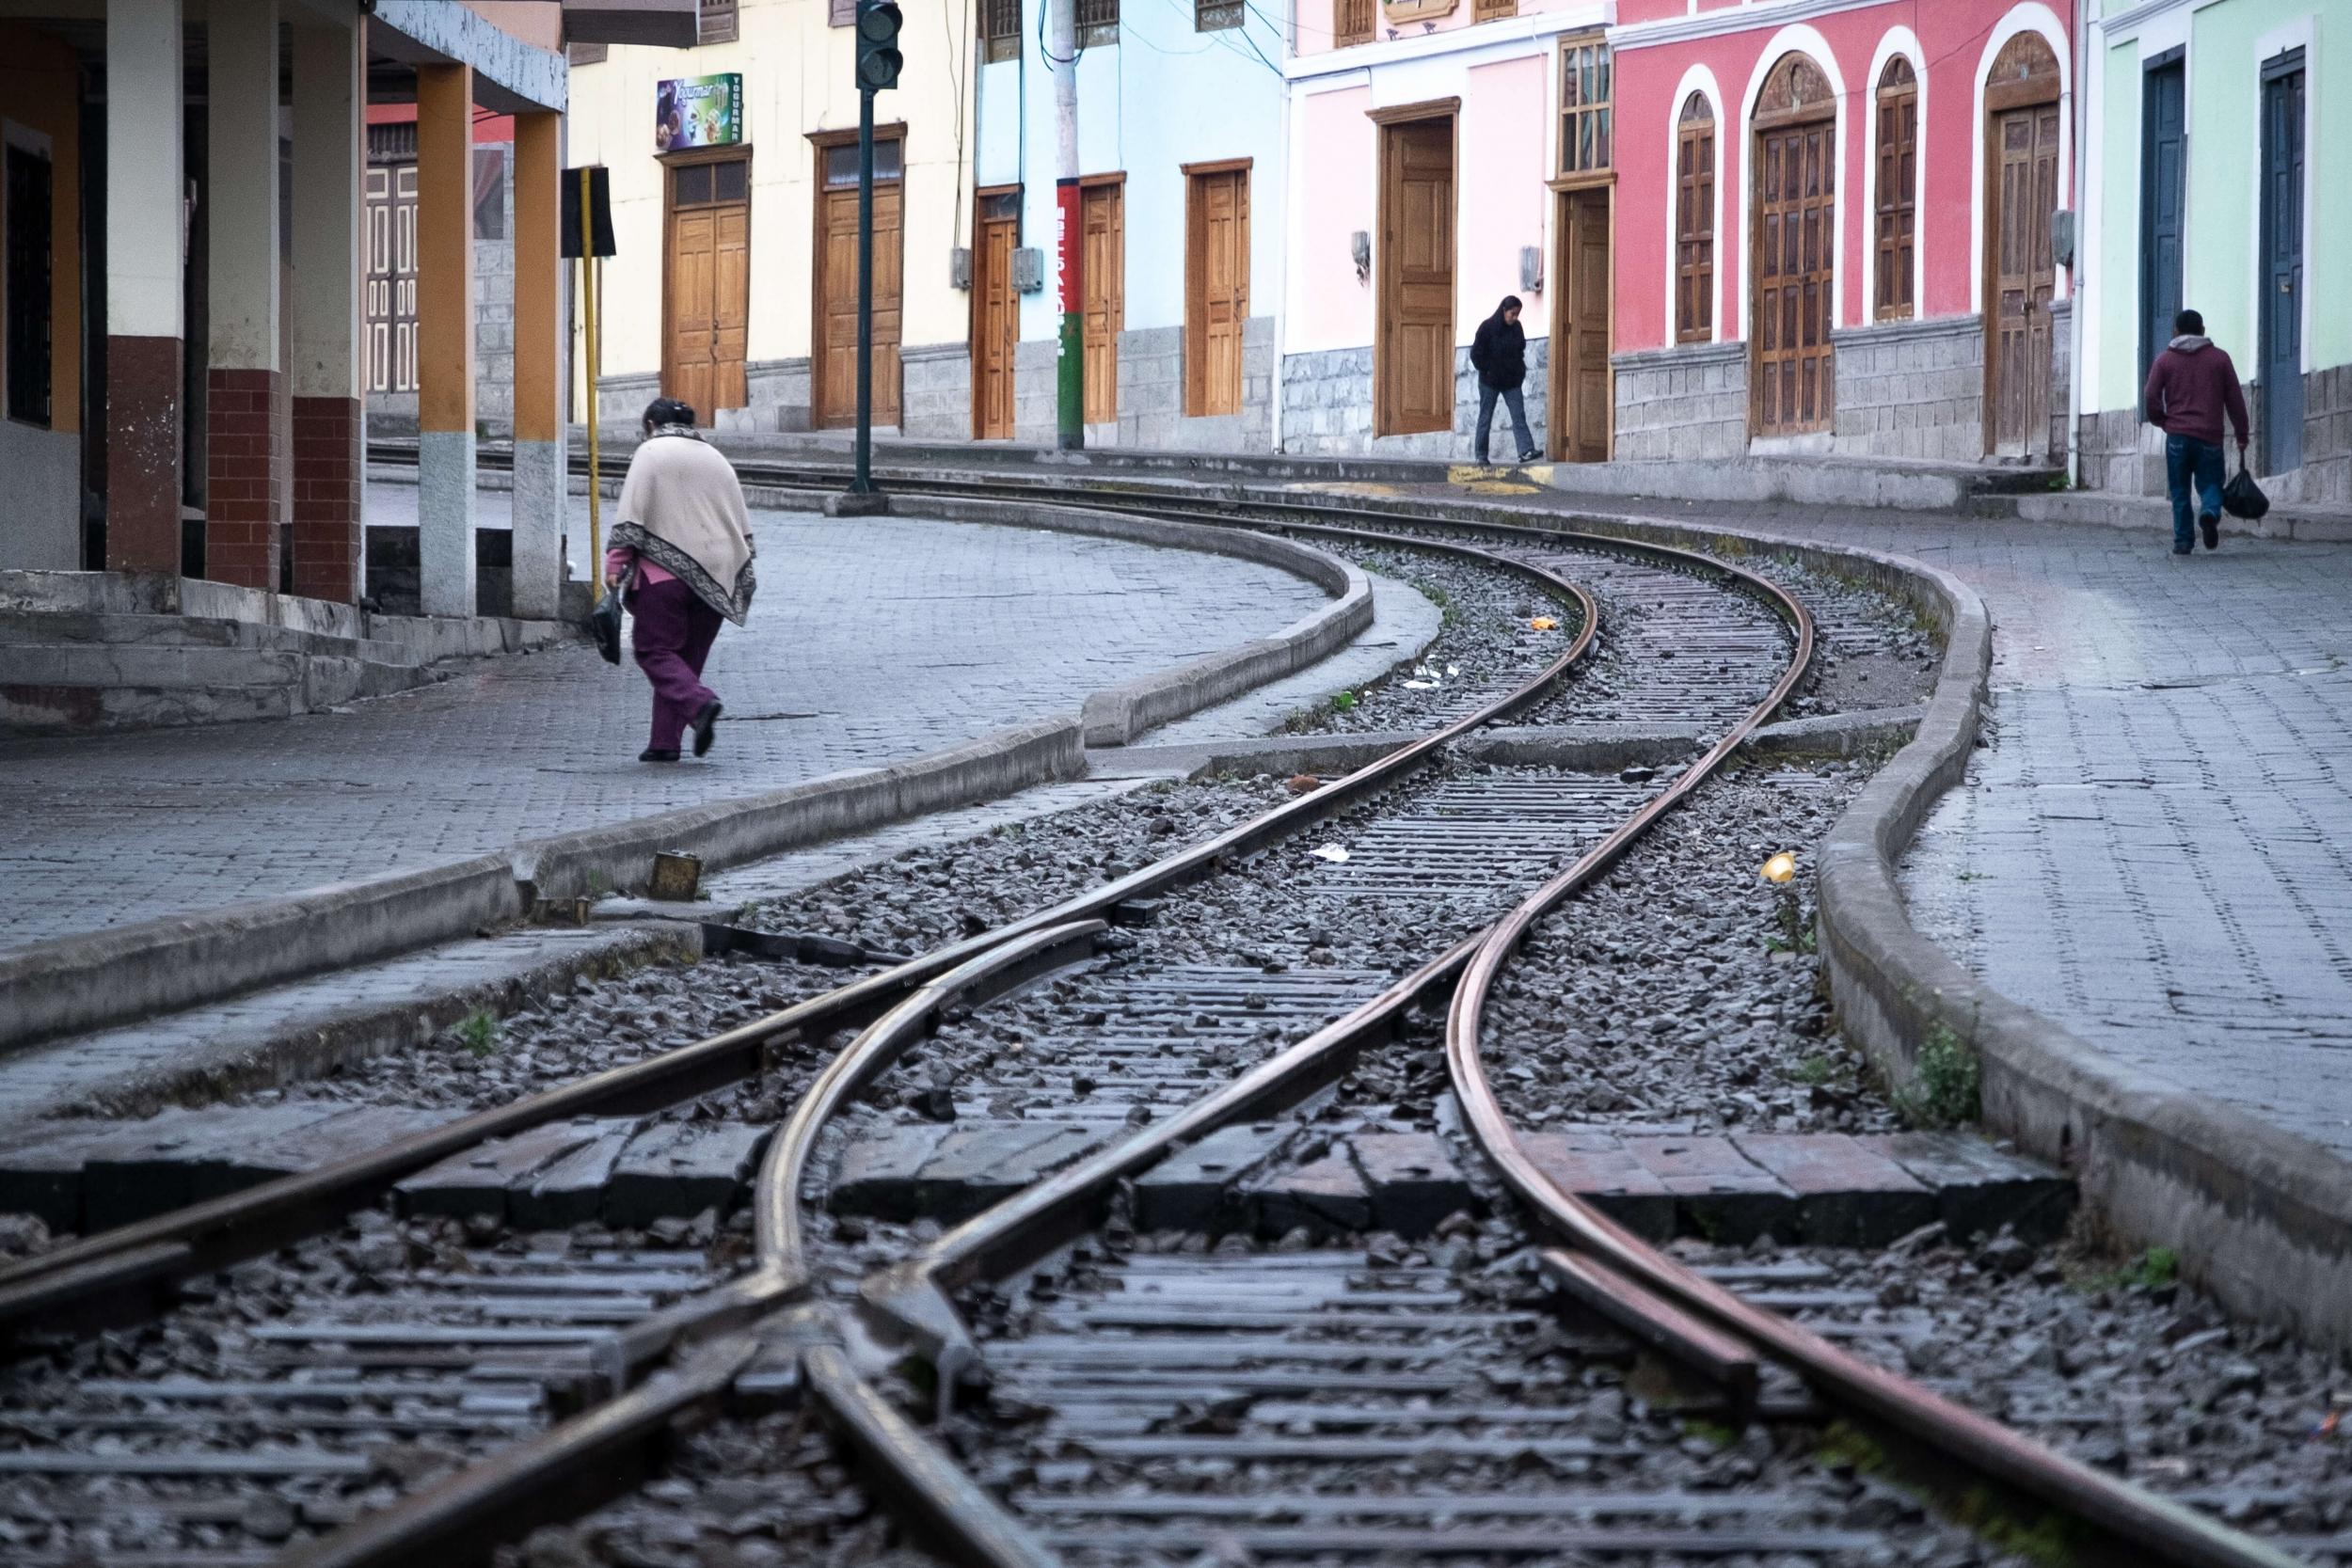 Alausi, Ecuador, Travel blog, Travel photography, Photography blog